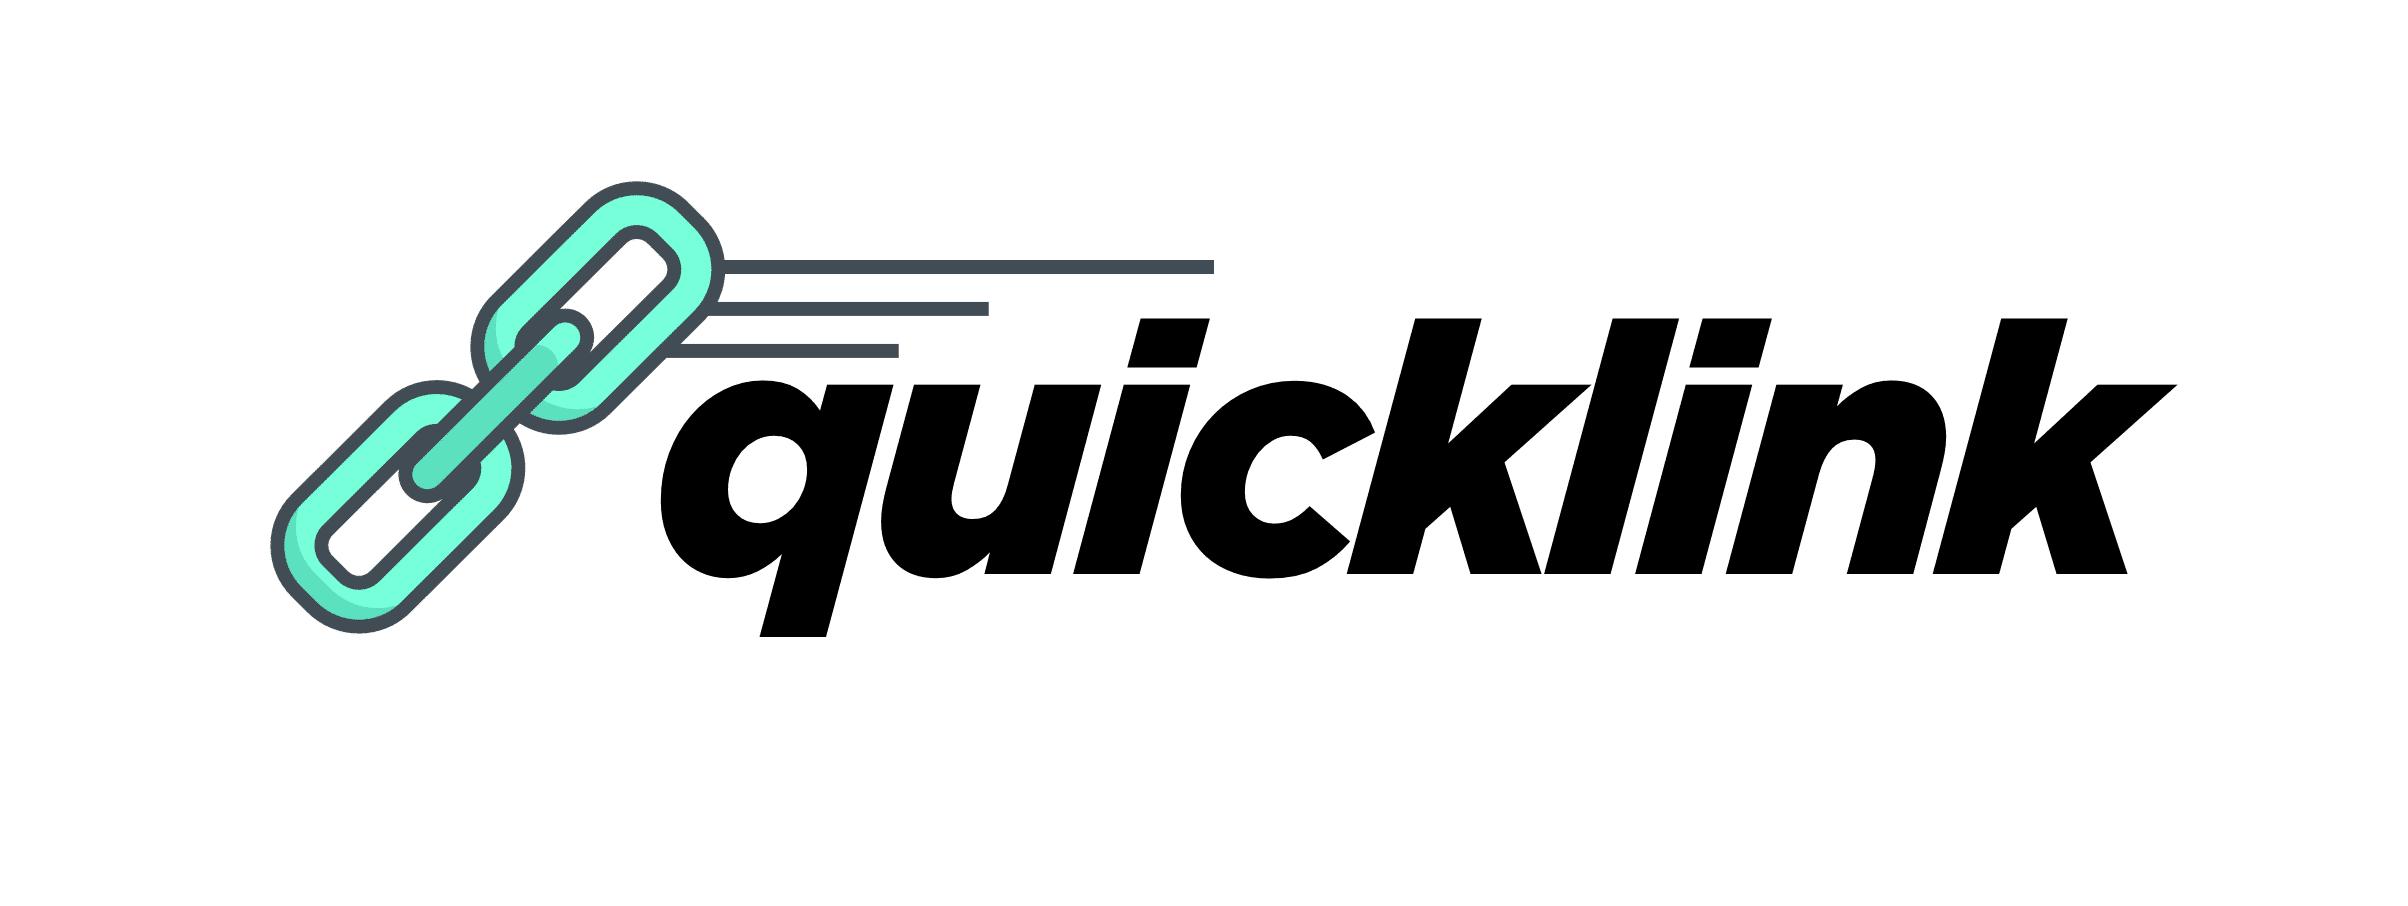 Quicklink logo